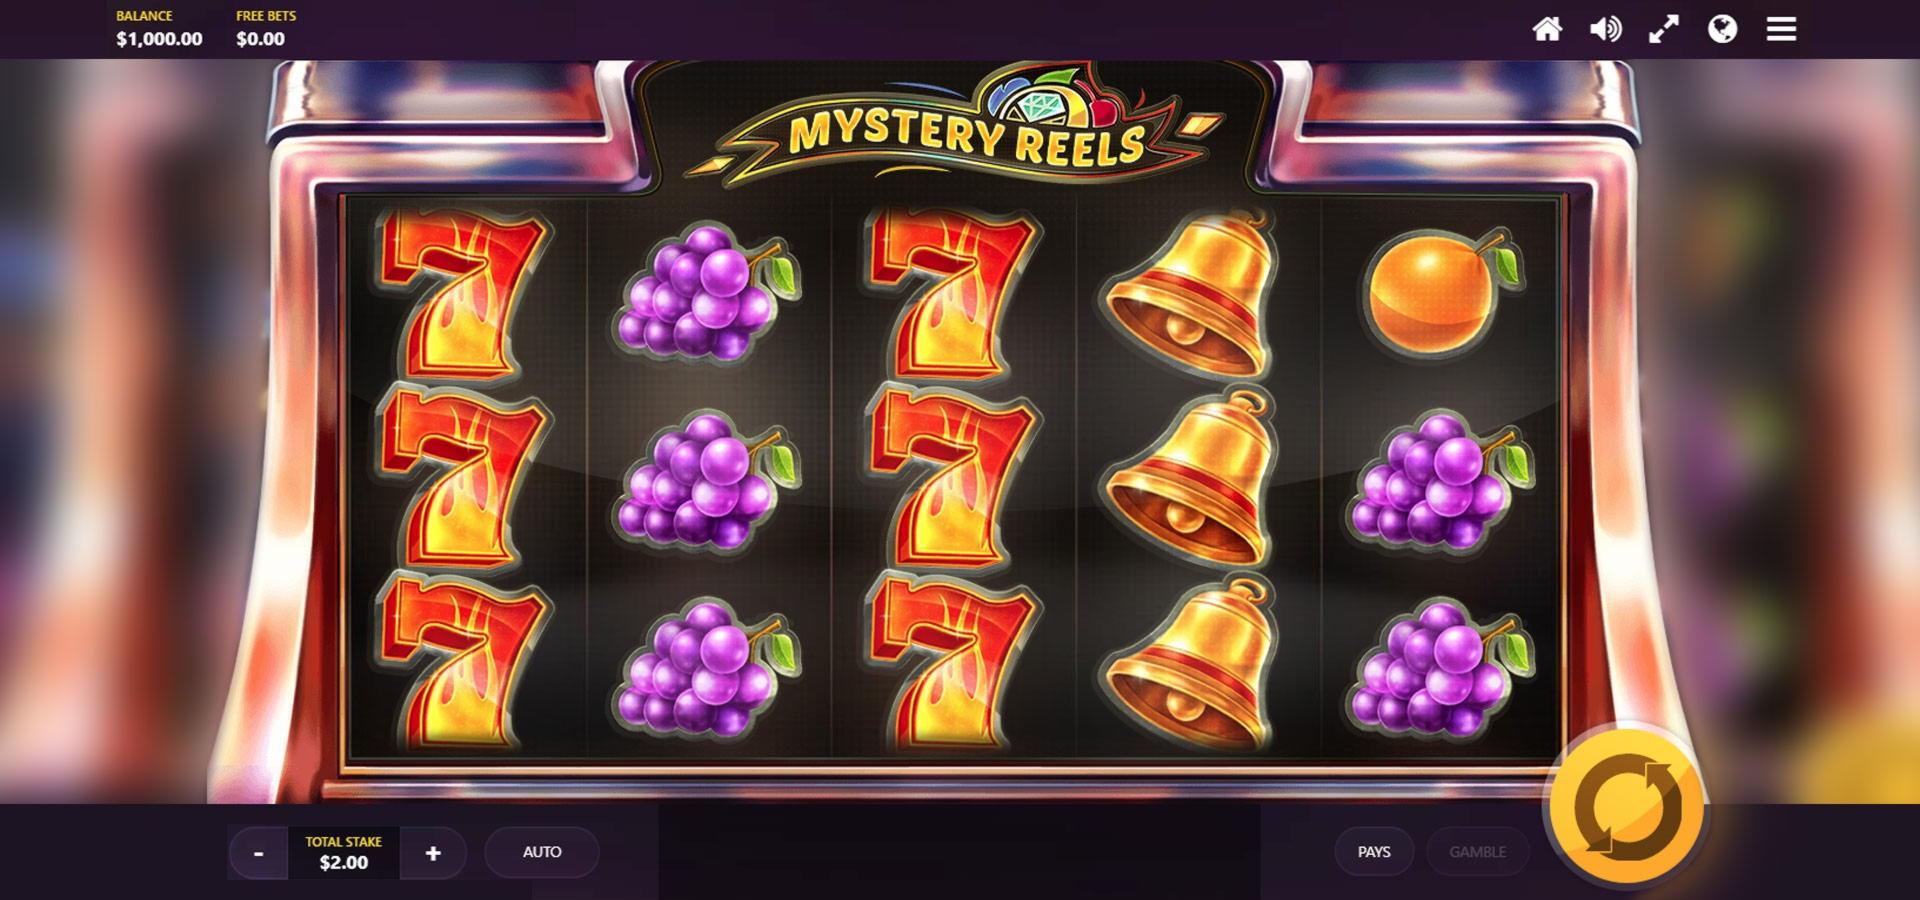 EUR 725 Mobile freeroll slot tournament at Tony Bet Casino